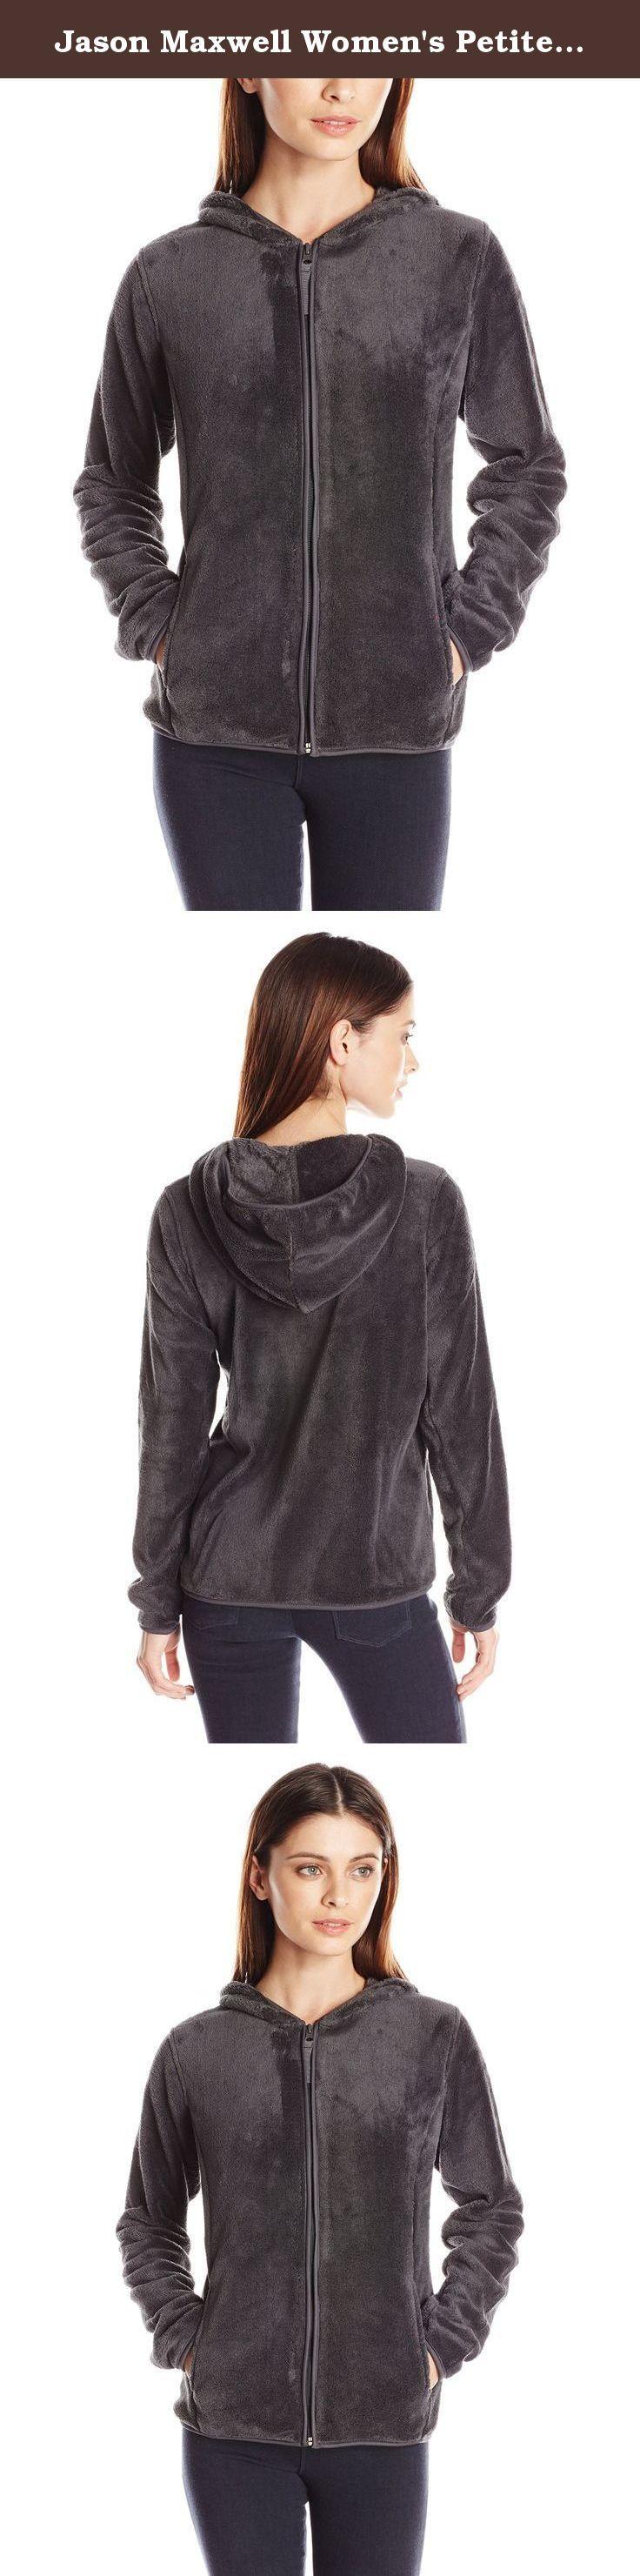 Jason Maxwell Women's Petite Full Zip Hooded Fleece Jacket, Charcoal, Petite/Small. Full zip hoodie fleece jacket with princess seams.